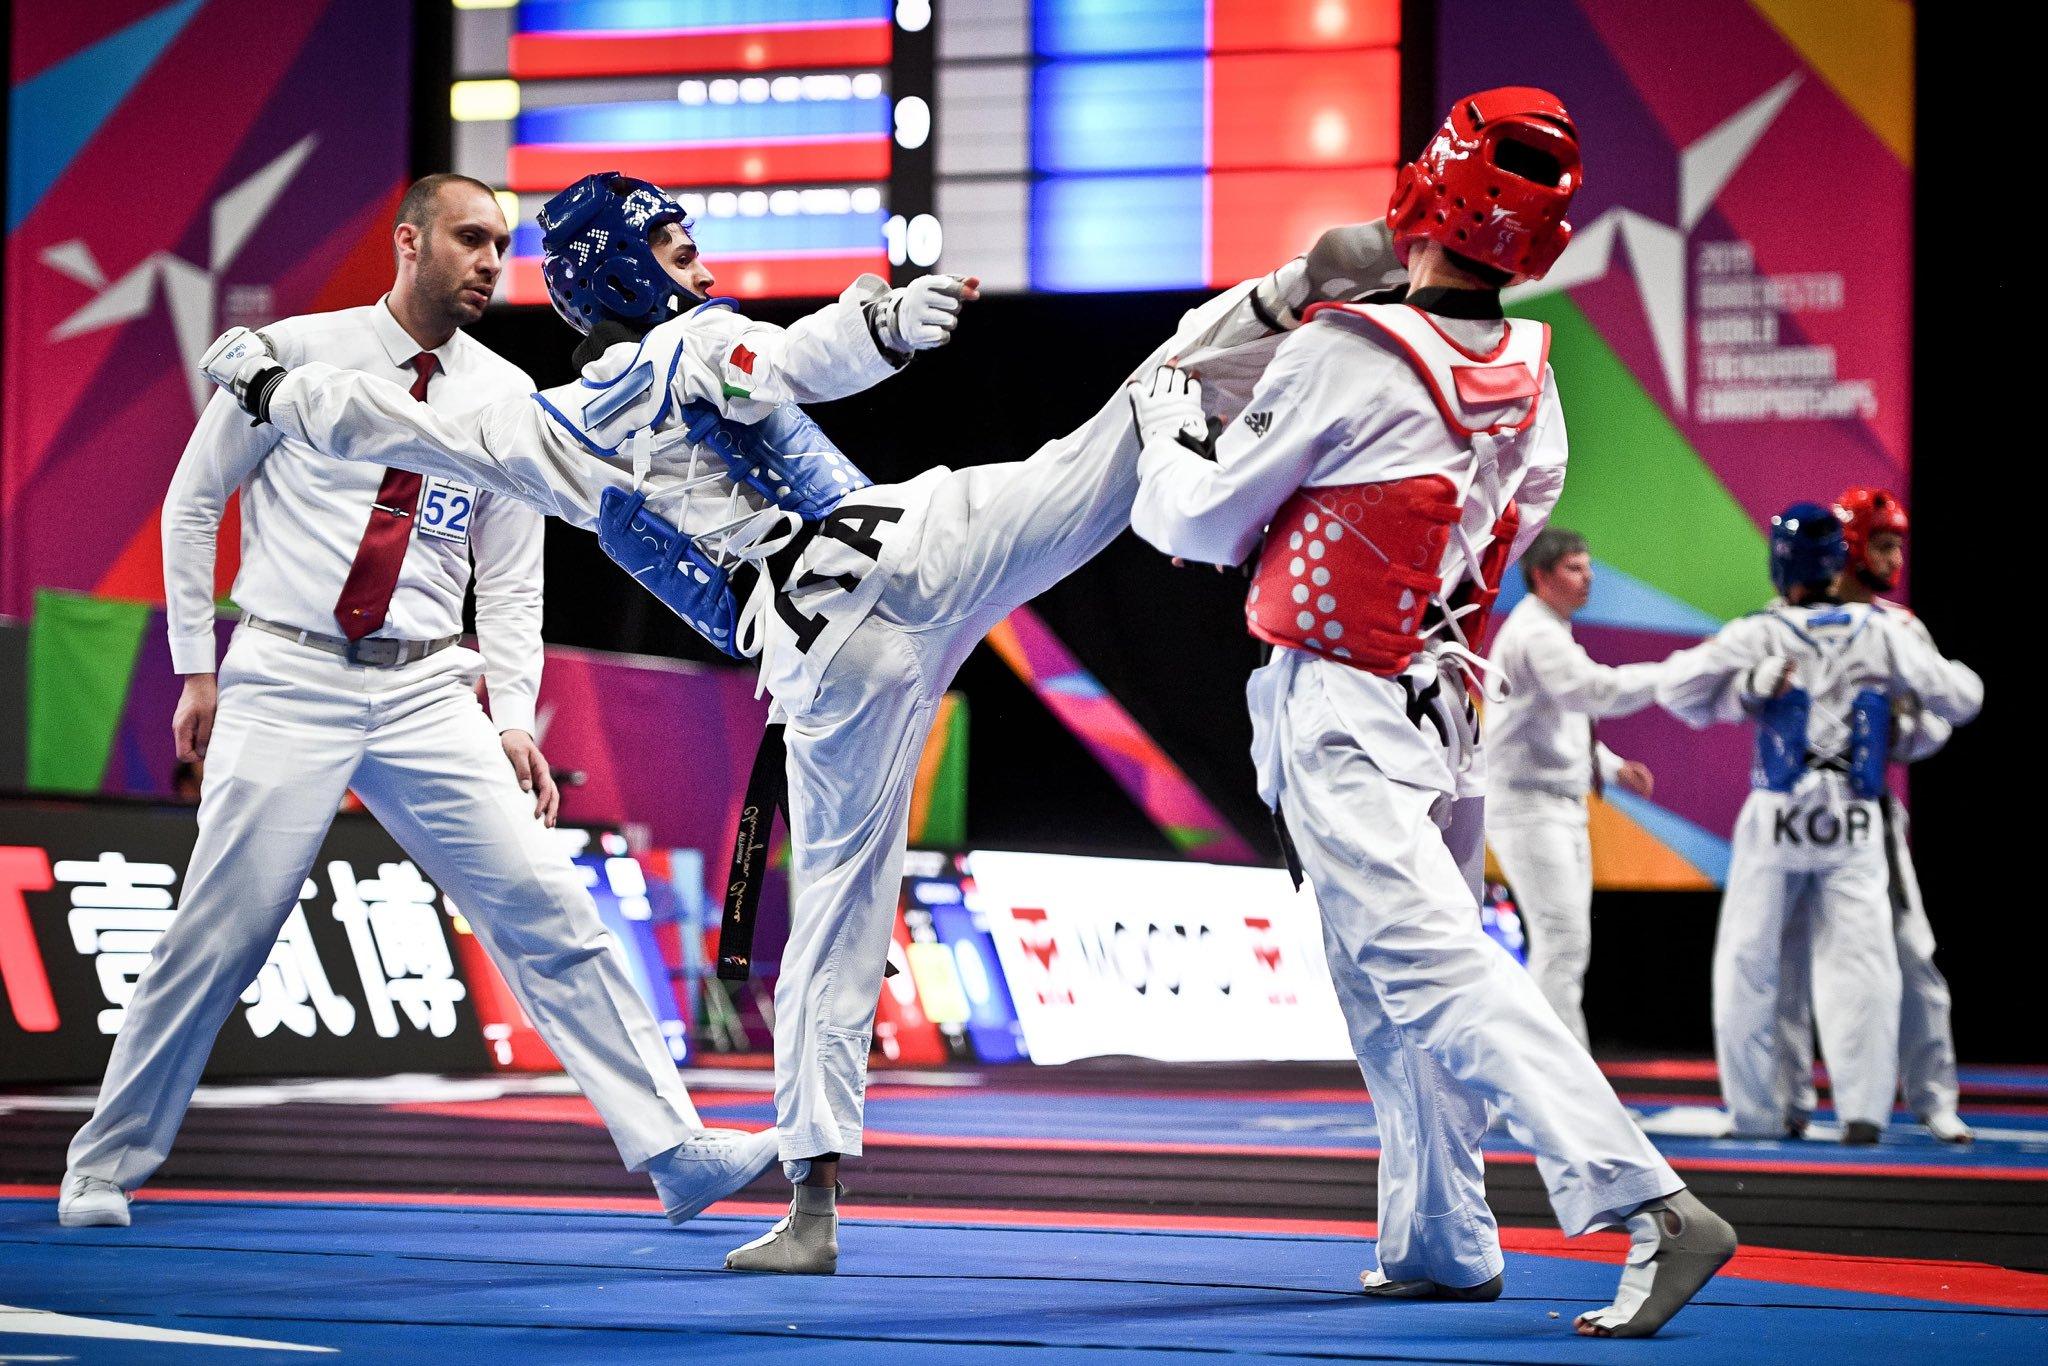 taekwondo grand prix chiba 2019 vito dell'aquila bronzo italia italy bronze categoria -58 kg giappone japan